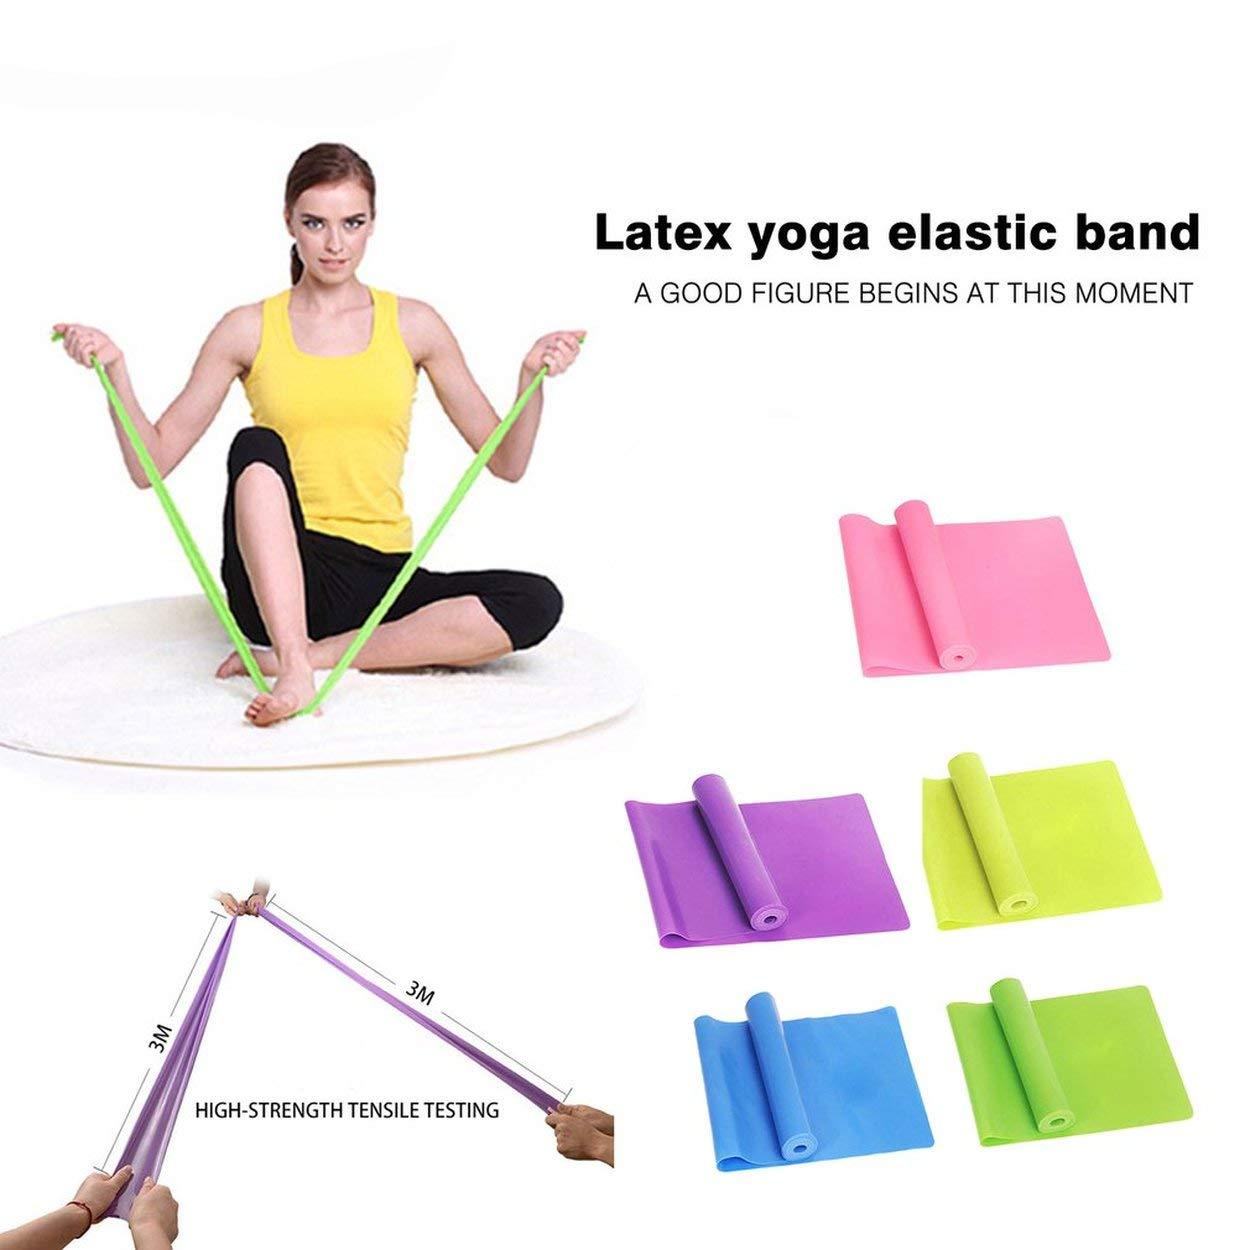 Lorenlli Deporte Gimnasio Fitness Equipo de yoga ...